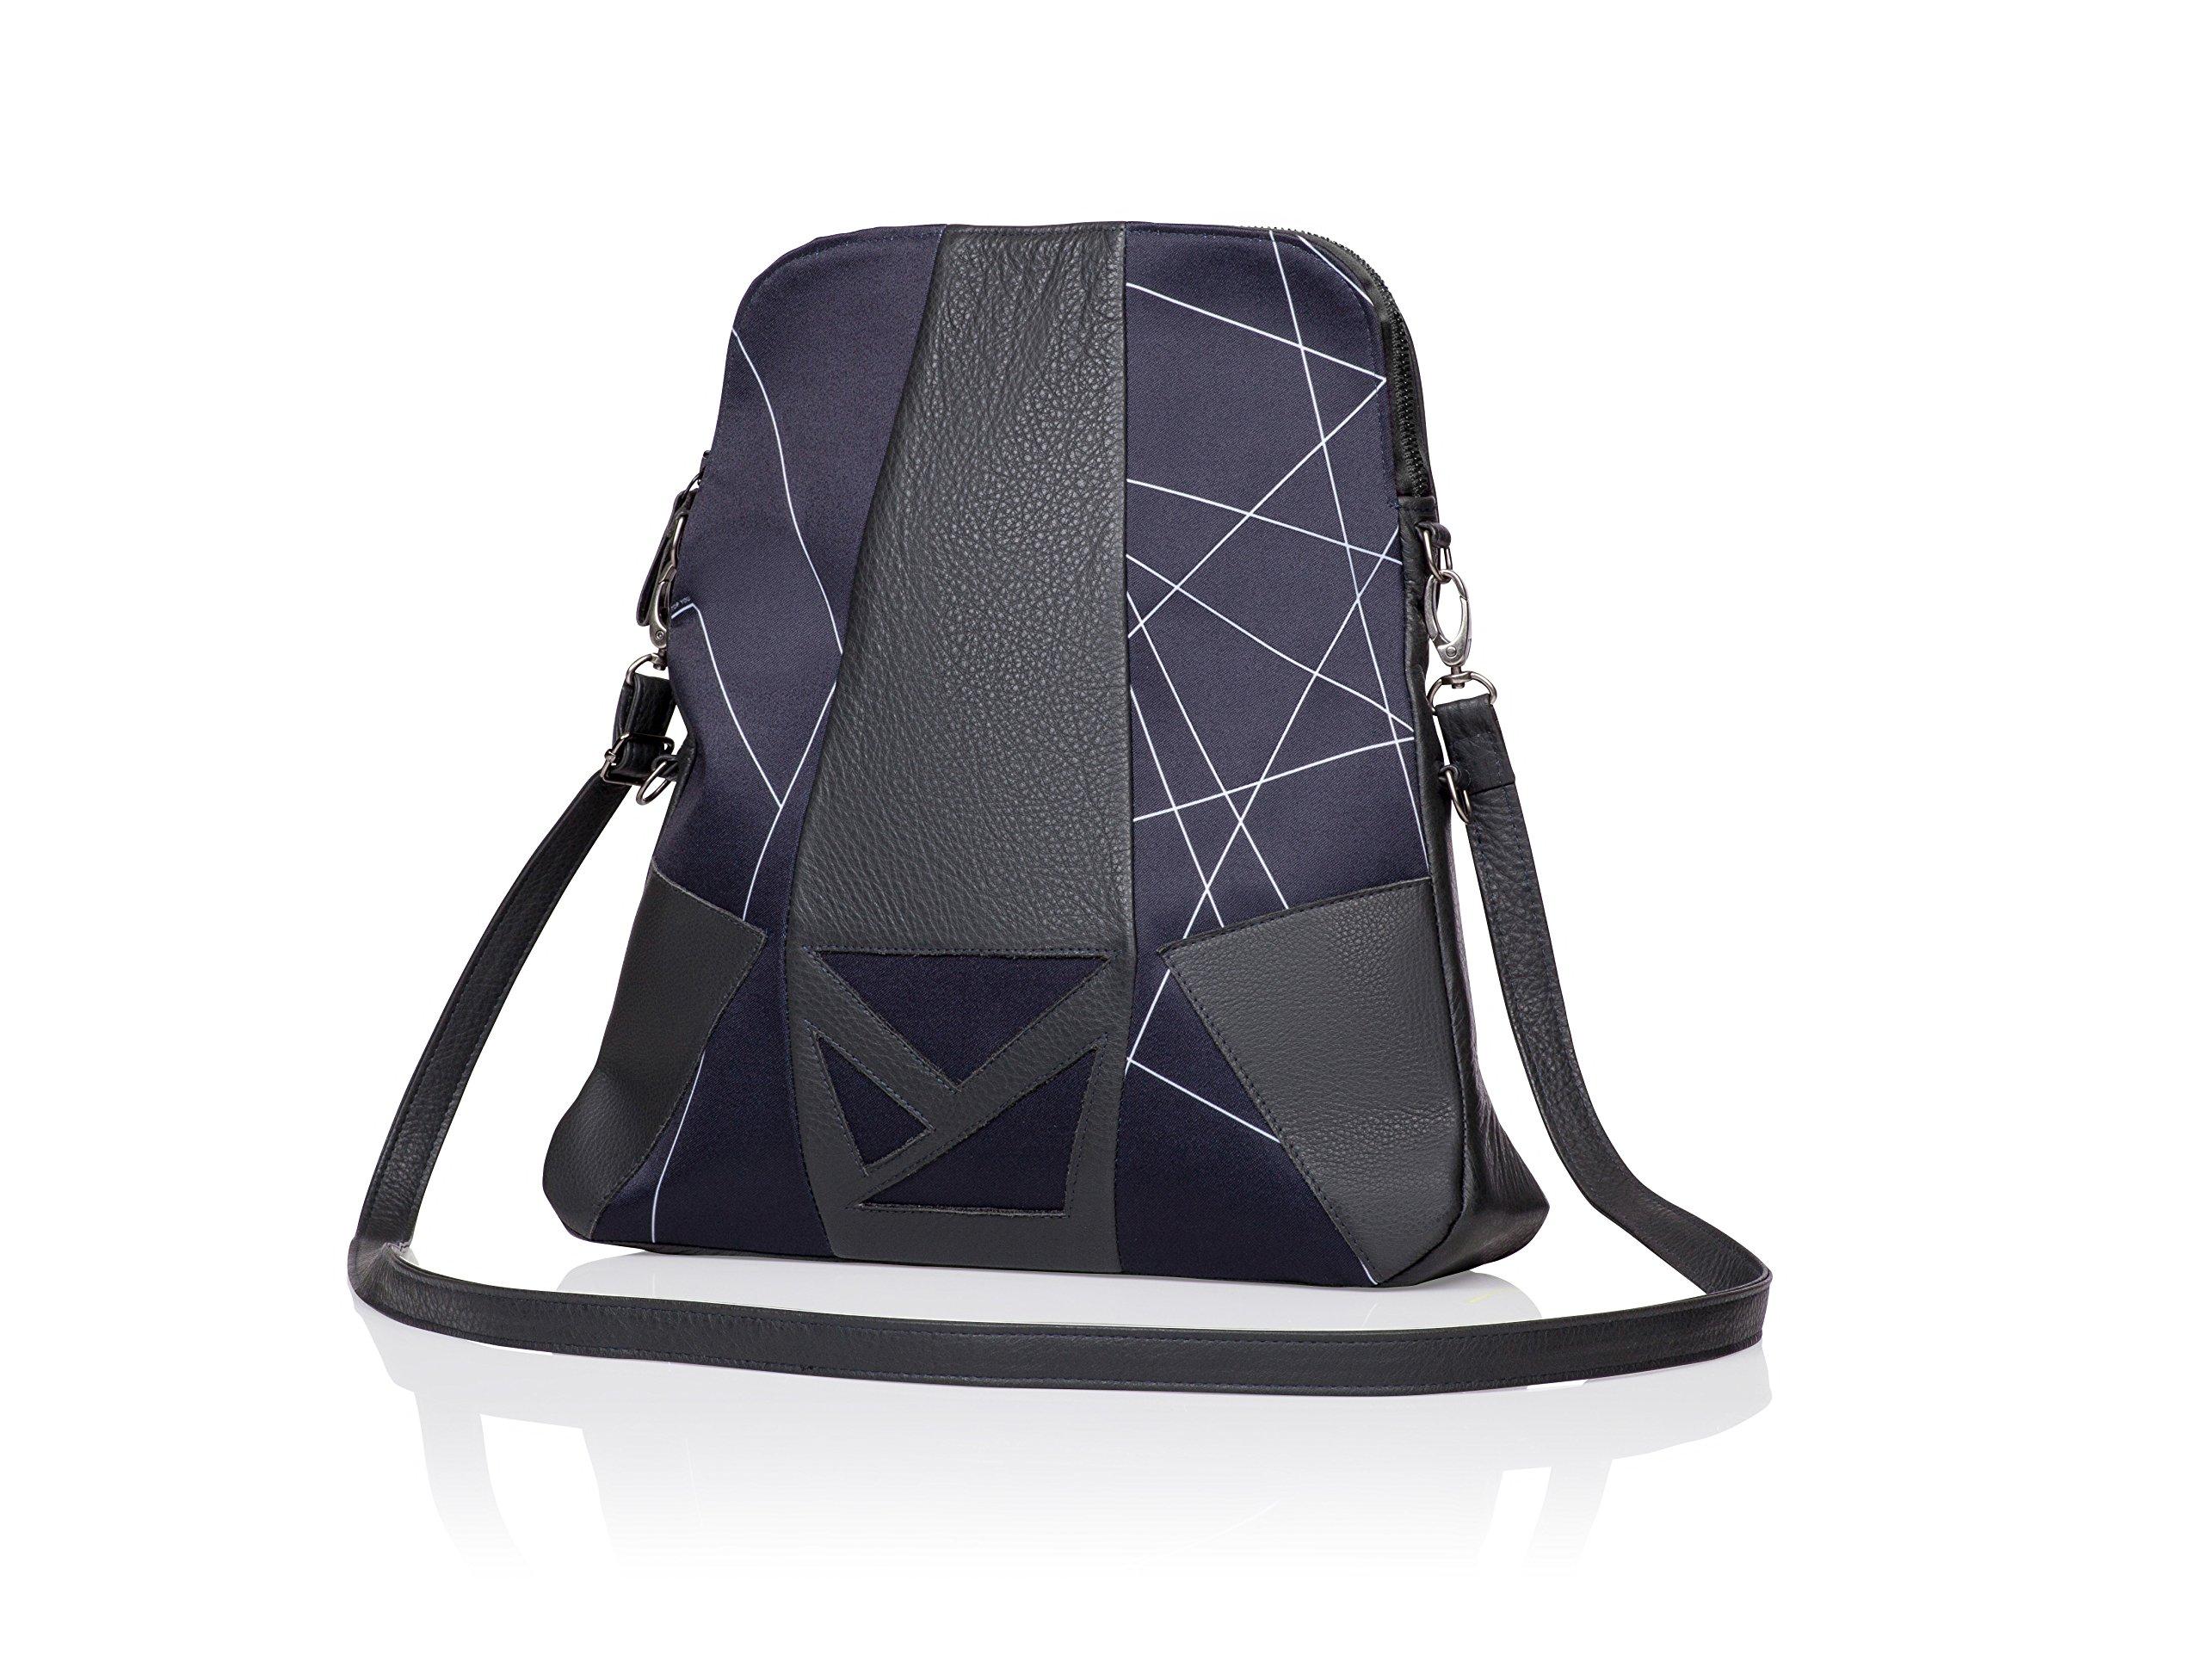 JoJo Handbags BECCA Convertible Backpack - Gray